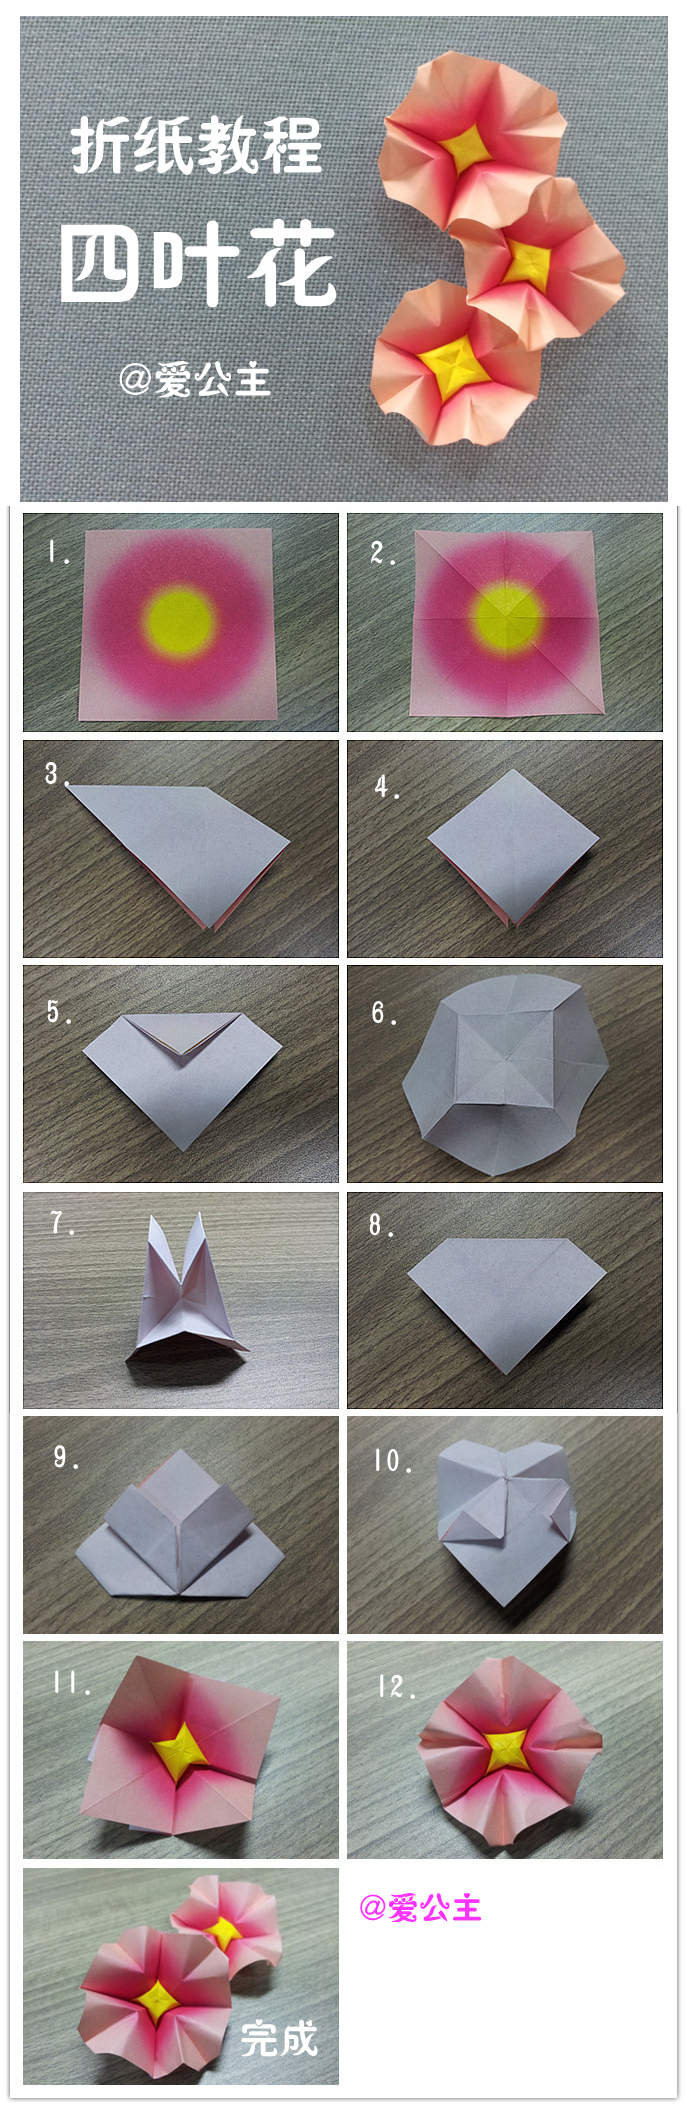 origami diy flower origami diy flower